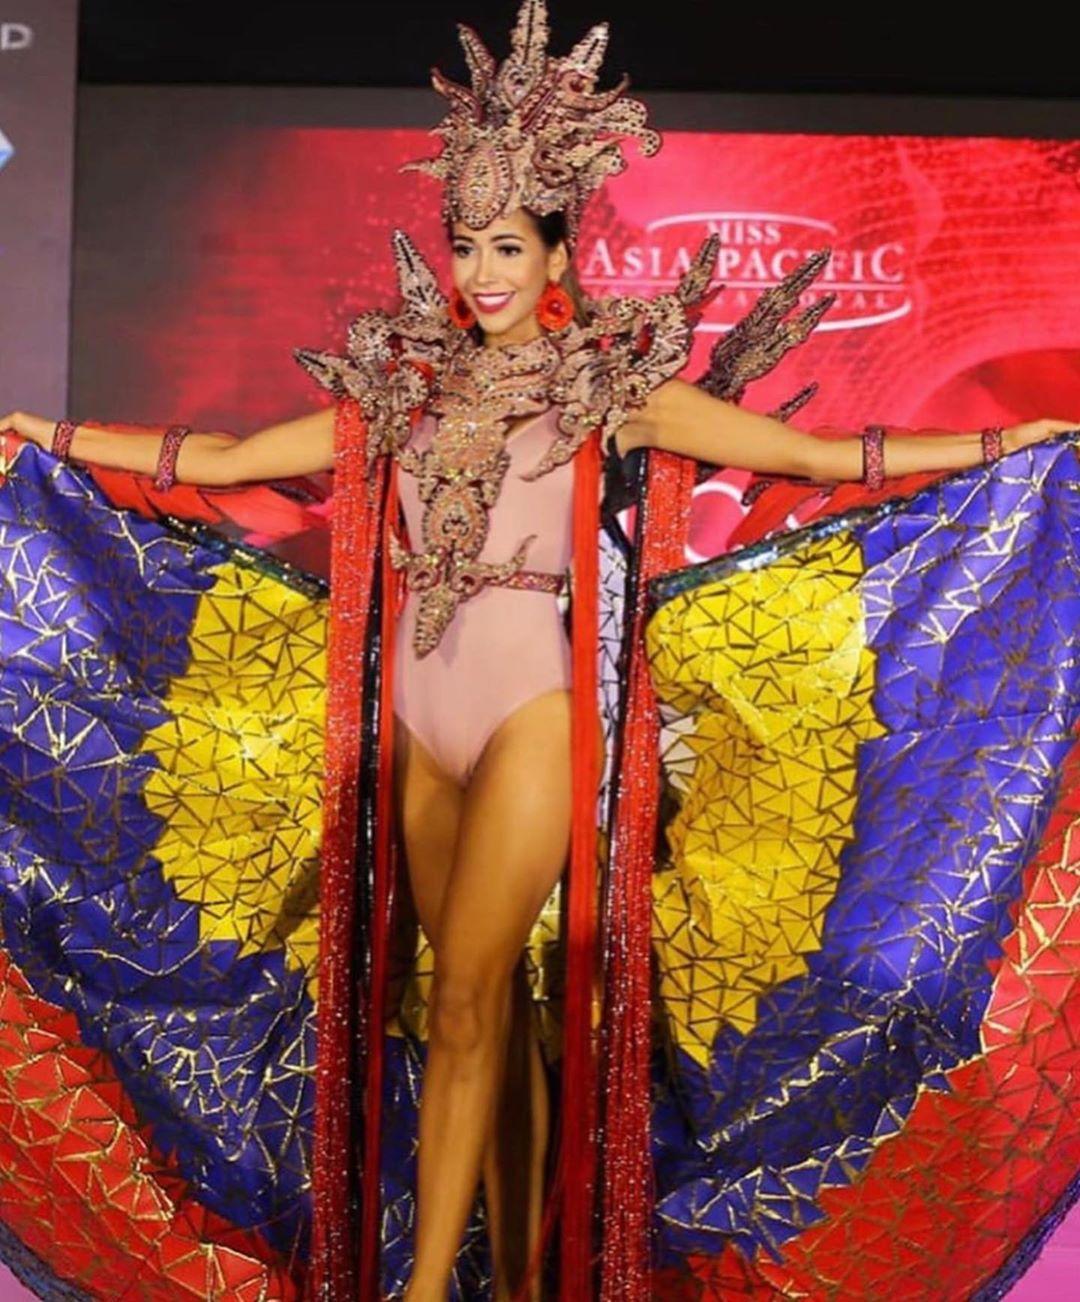 alejandra rodriguez osorio, miss asia pacific colombia 2019. - Página 2 69803210